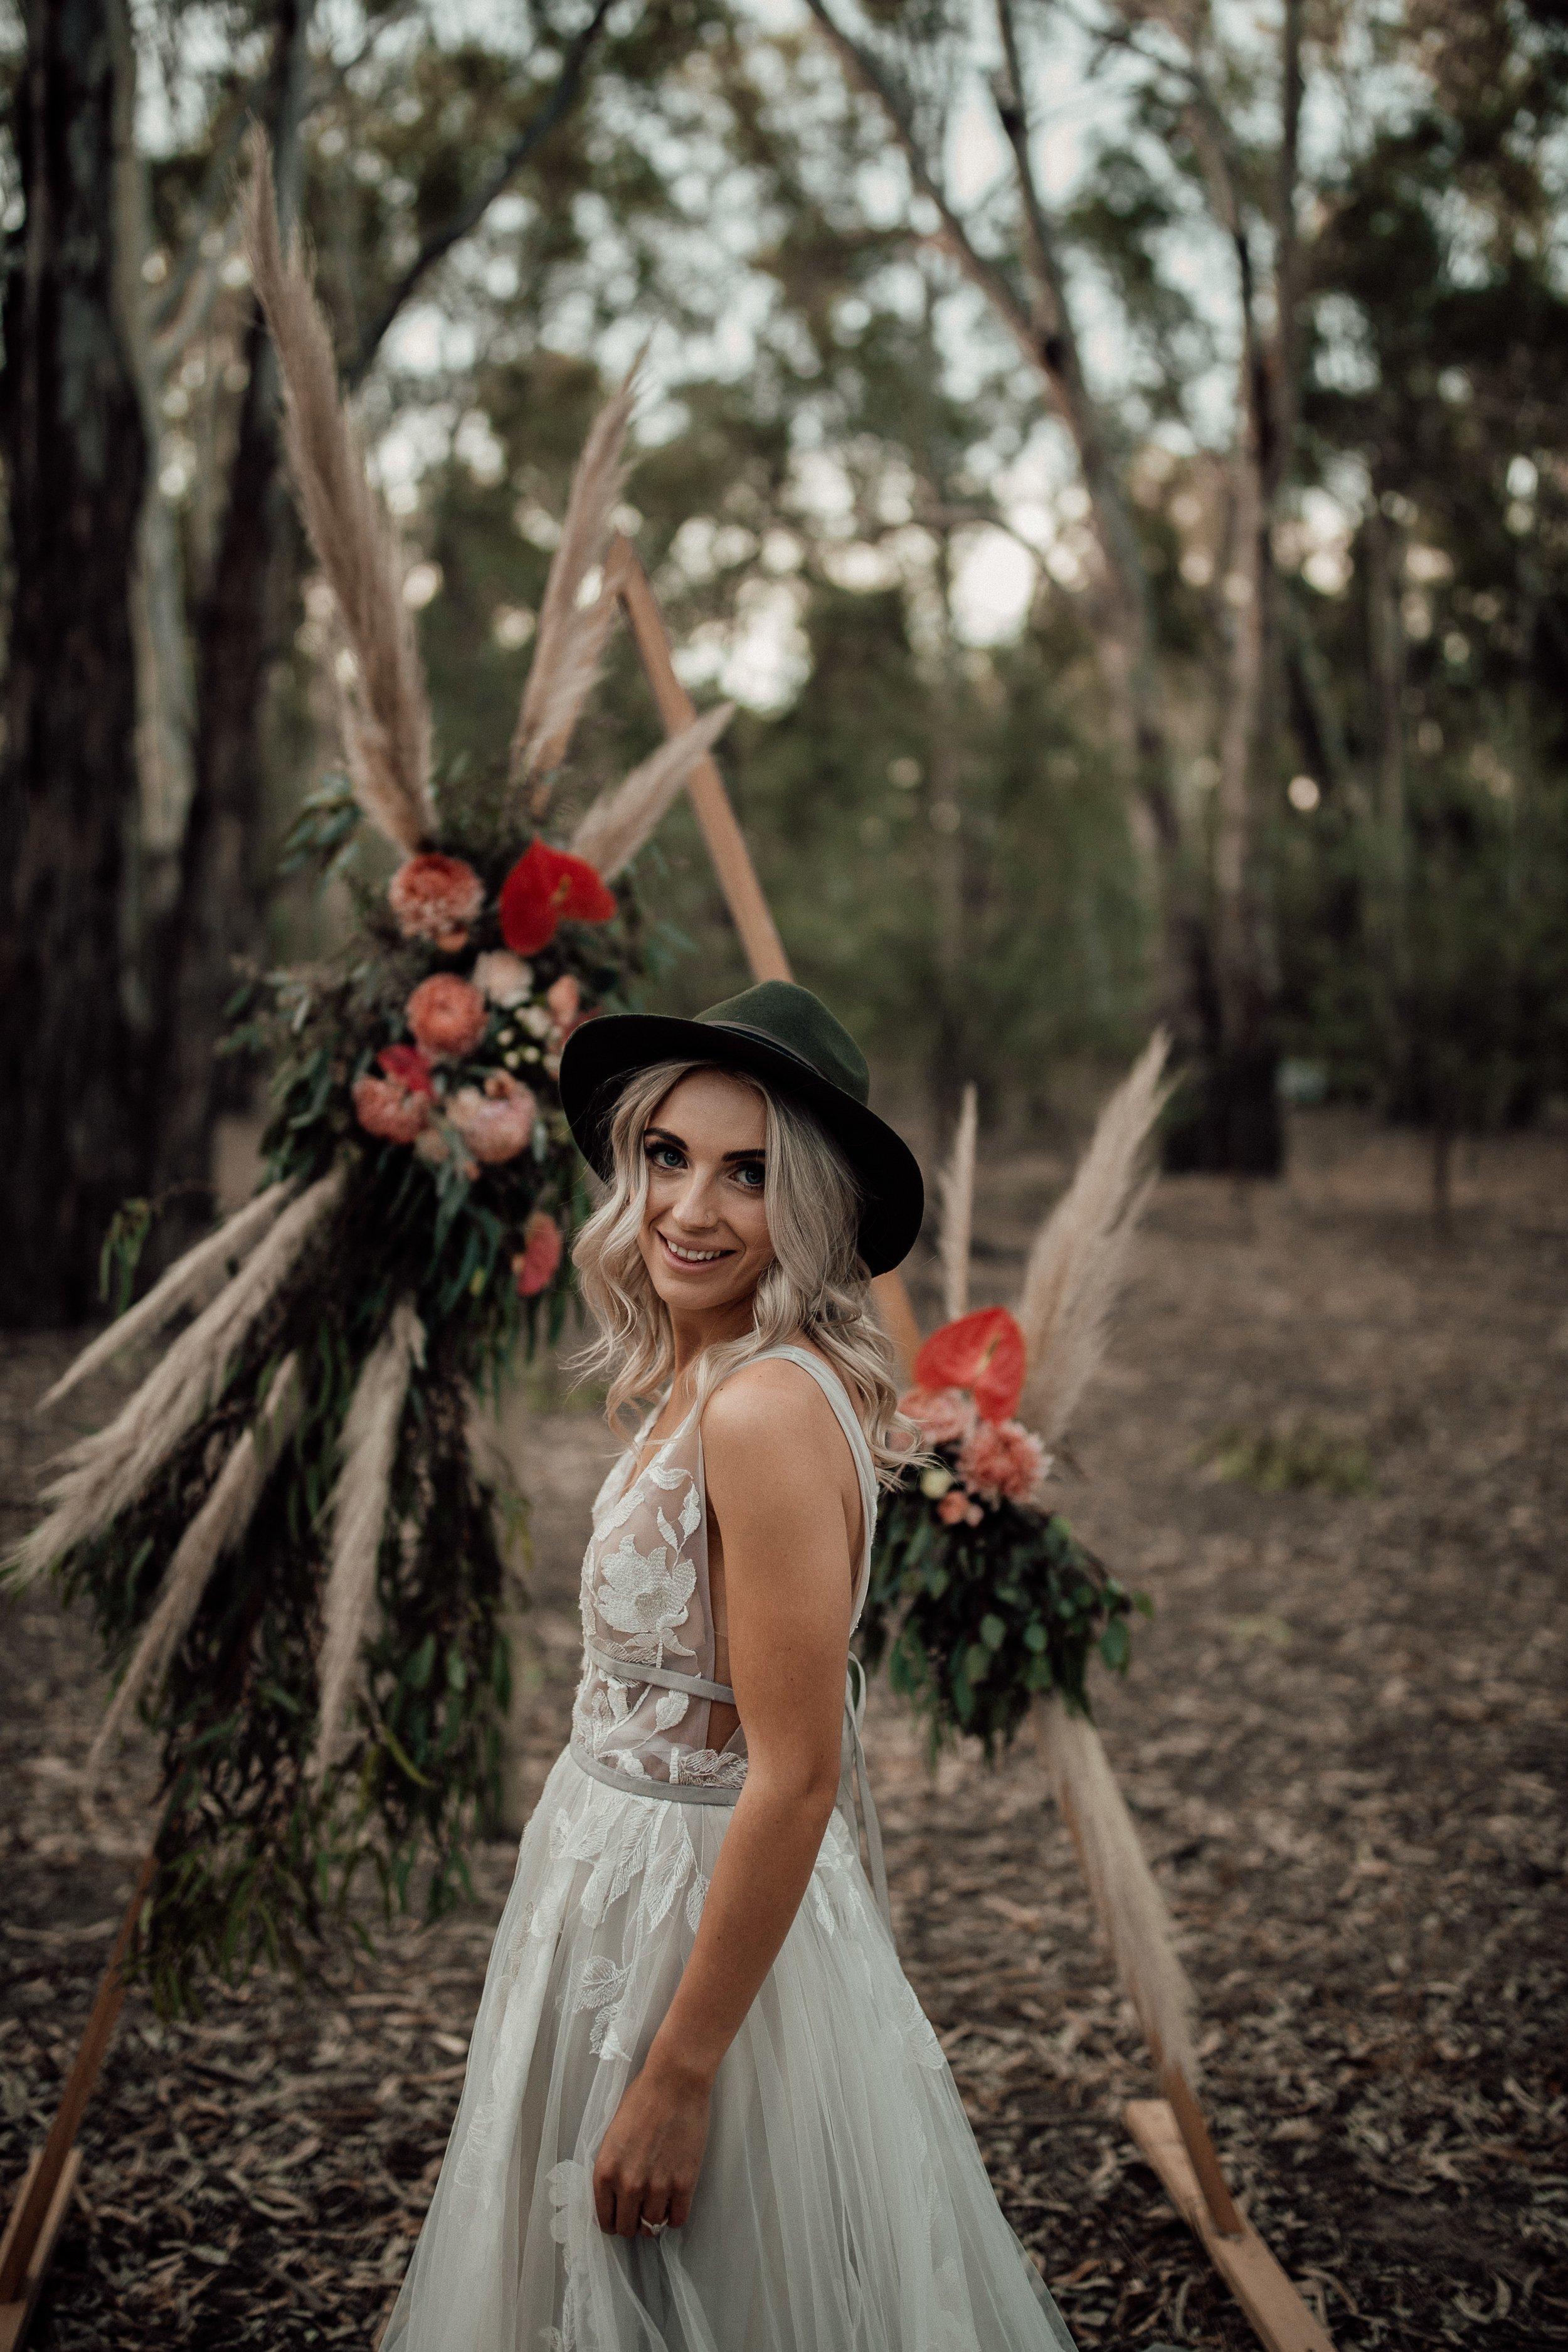 mickalathomas_puremacphotography_weddingphotographer_couplephotographer_Sheppartonphotographer_1501.jpg